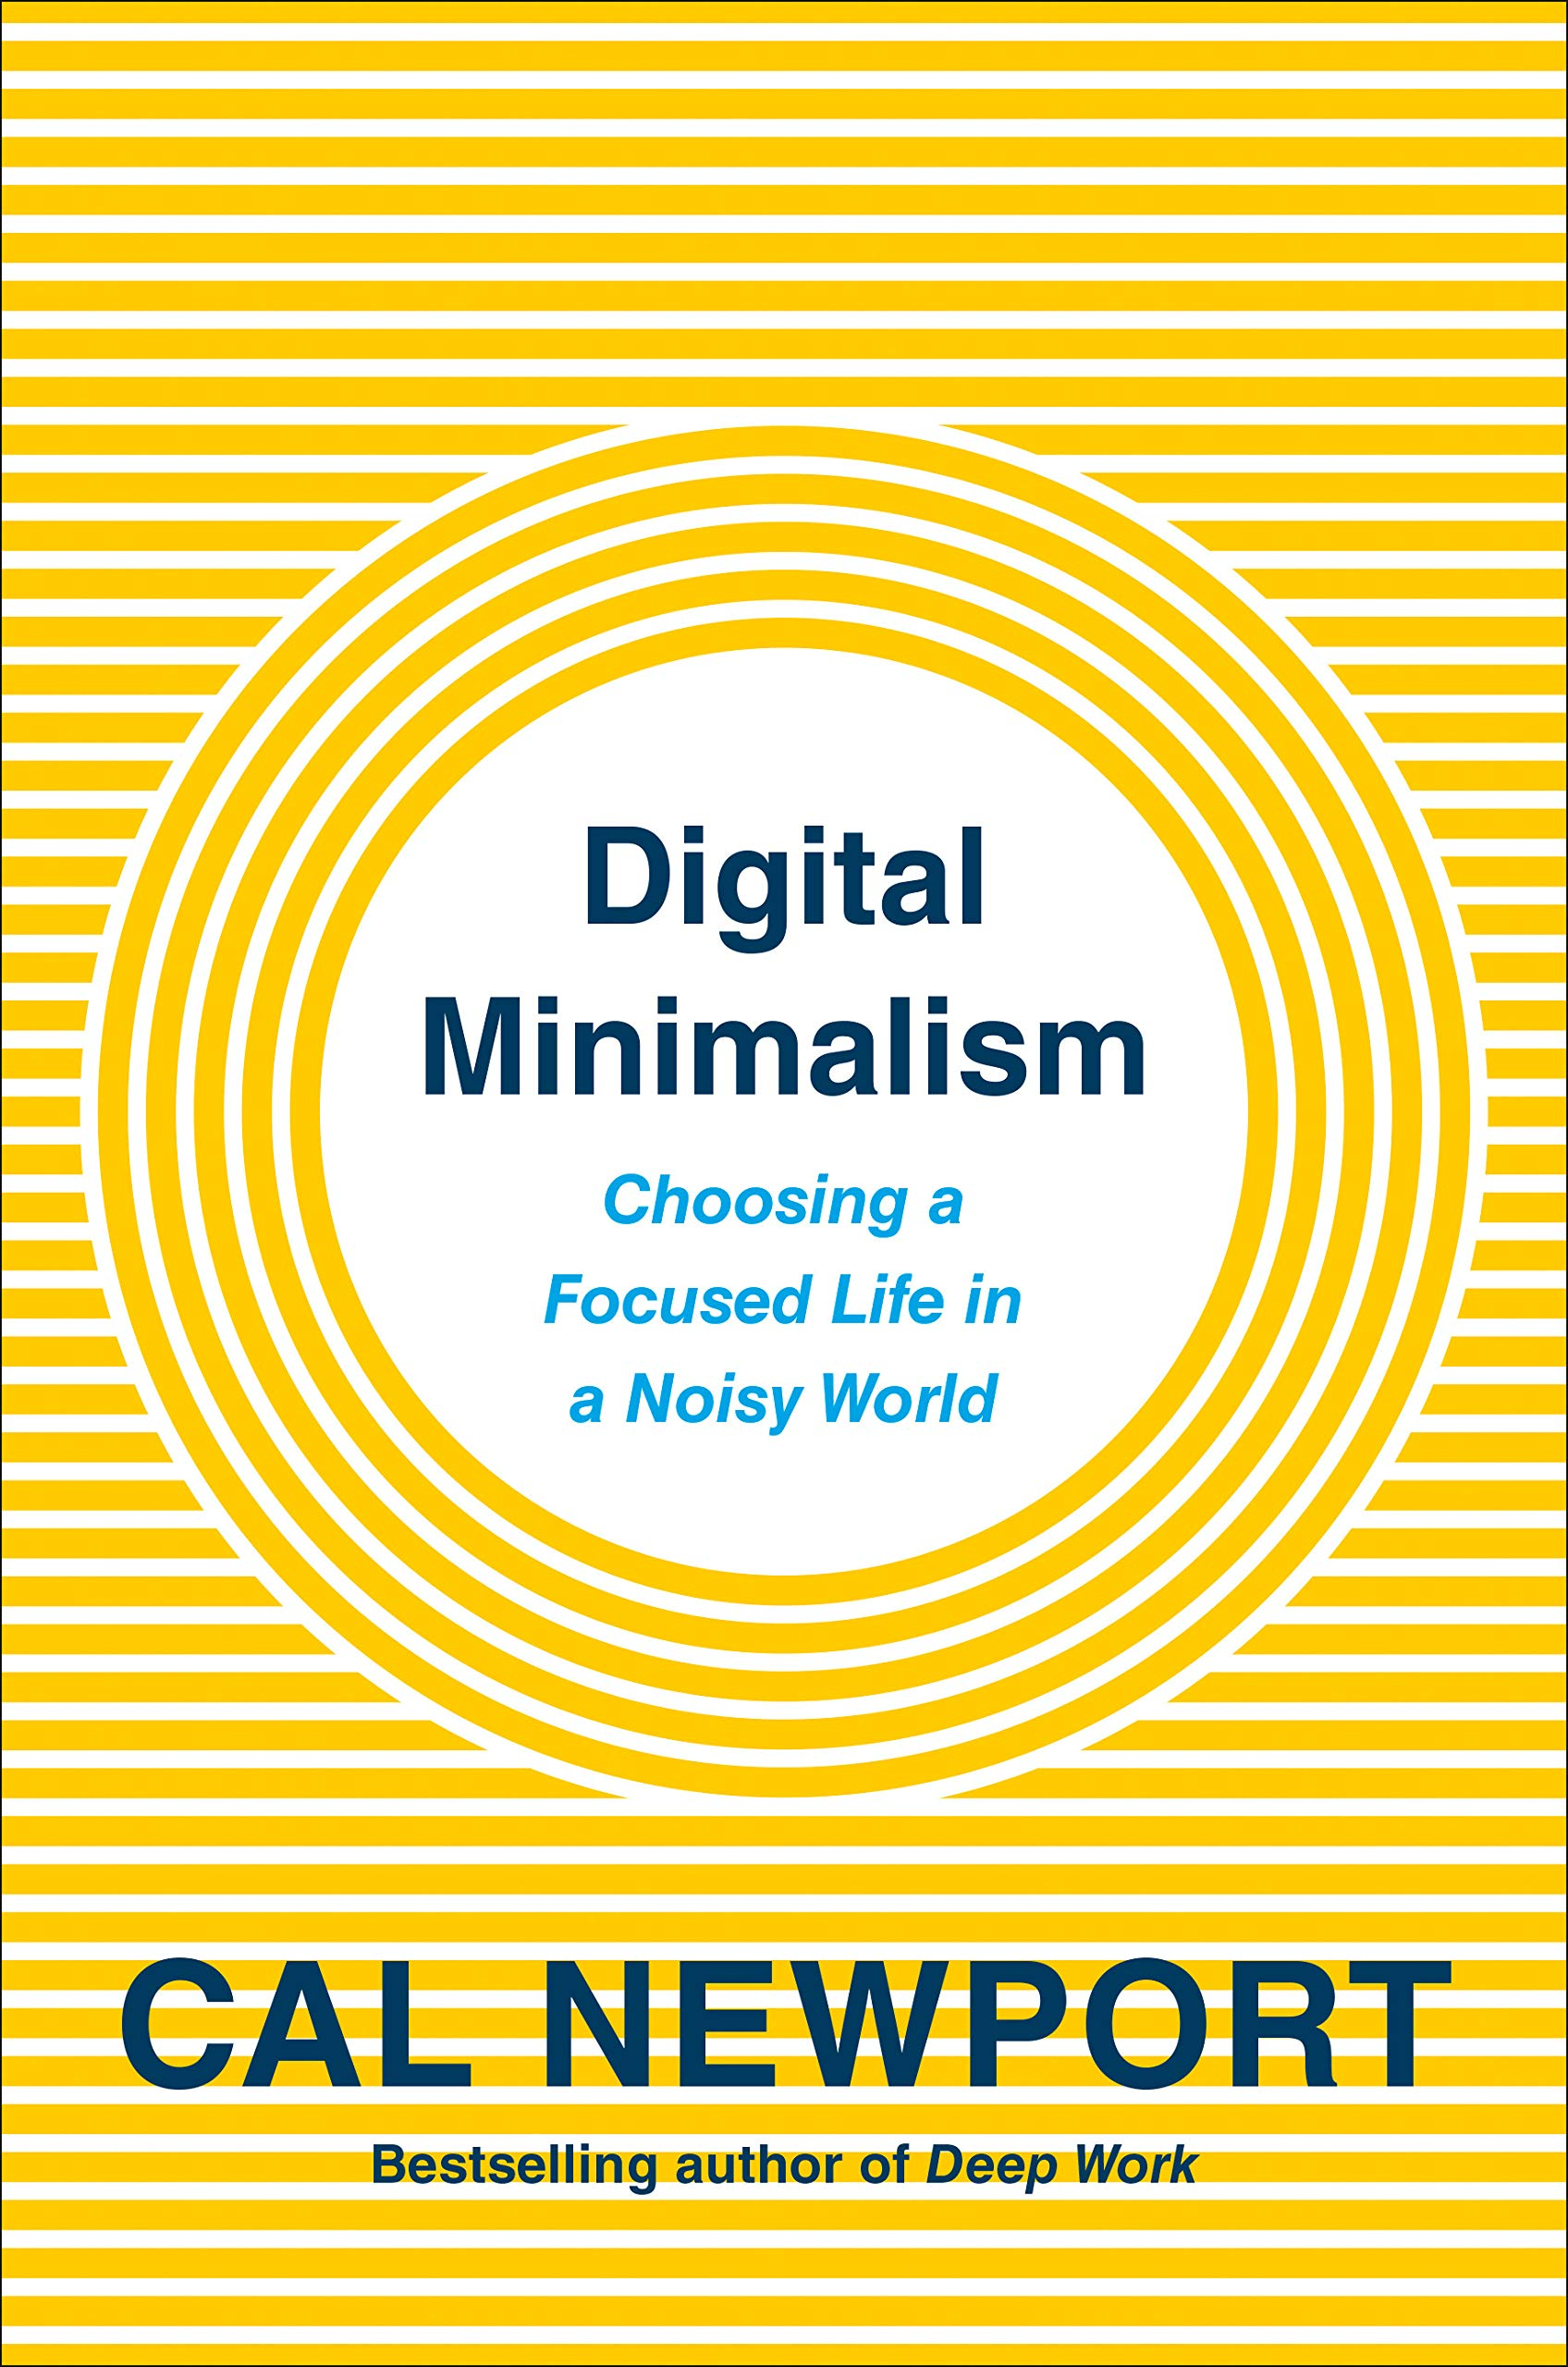 digital-minimalism-choosing-a-focused-life-in-a-noisy-world-by-cal-newport